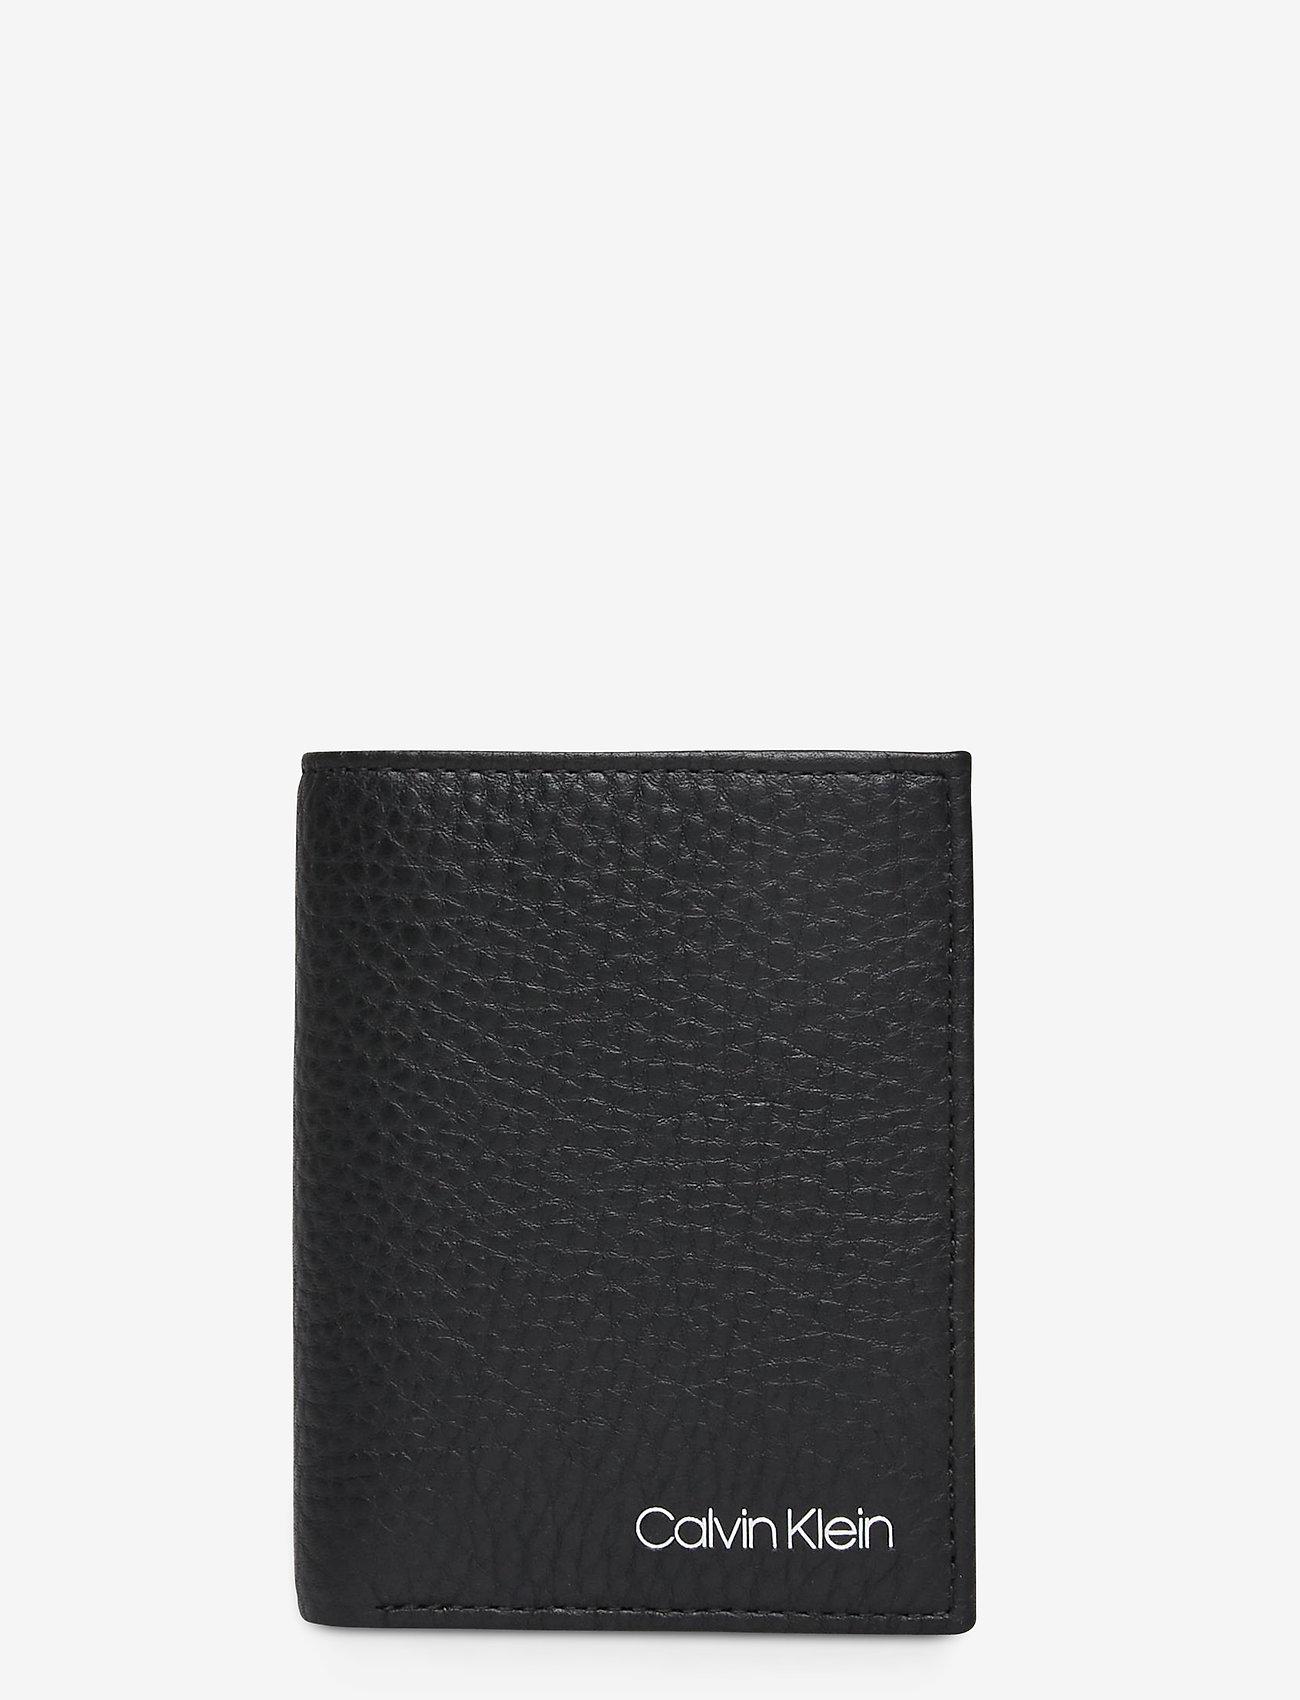 Calvin Klein - CK QT POCKET MINI 6CC - wallets - black - 0